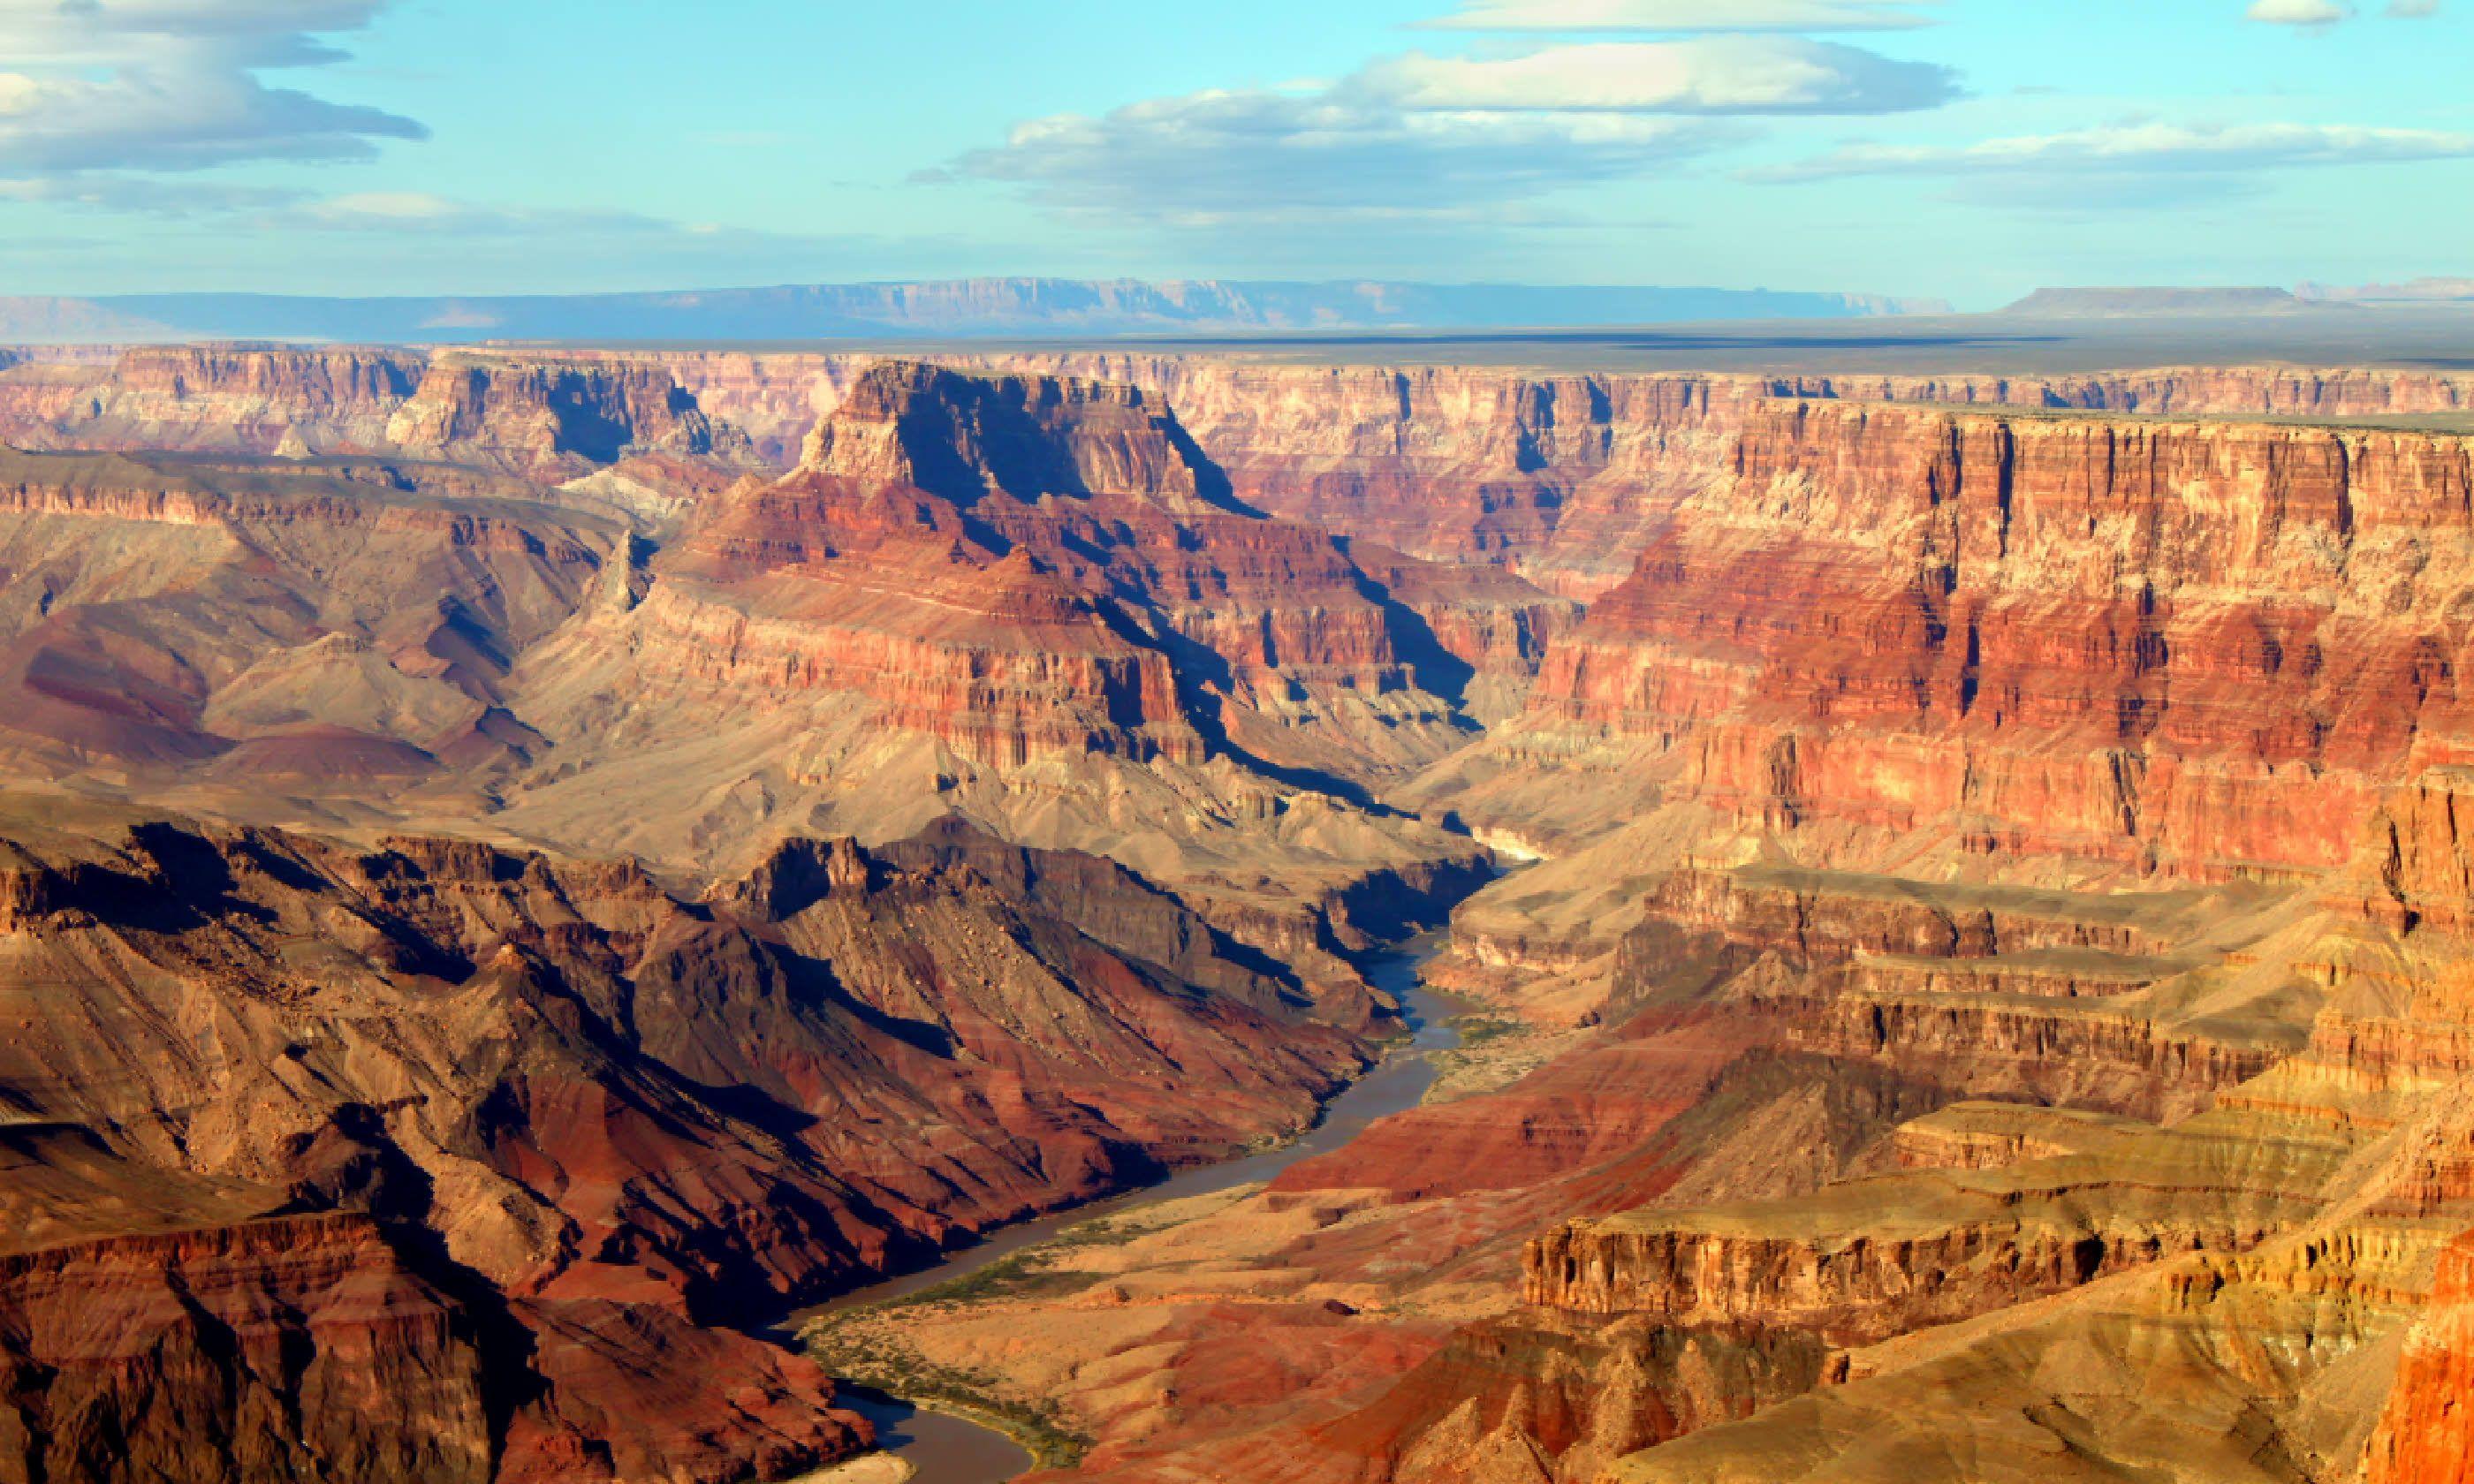 Grand Canyon National Park (Shutterstock)